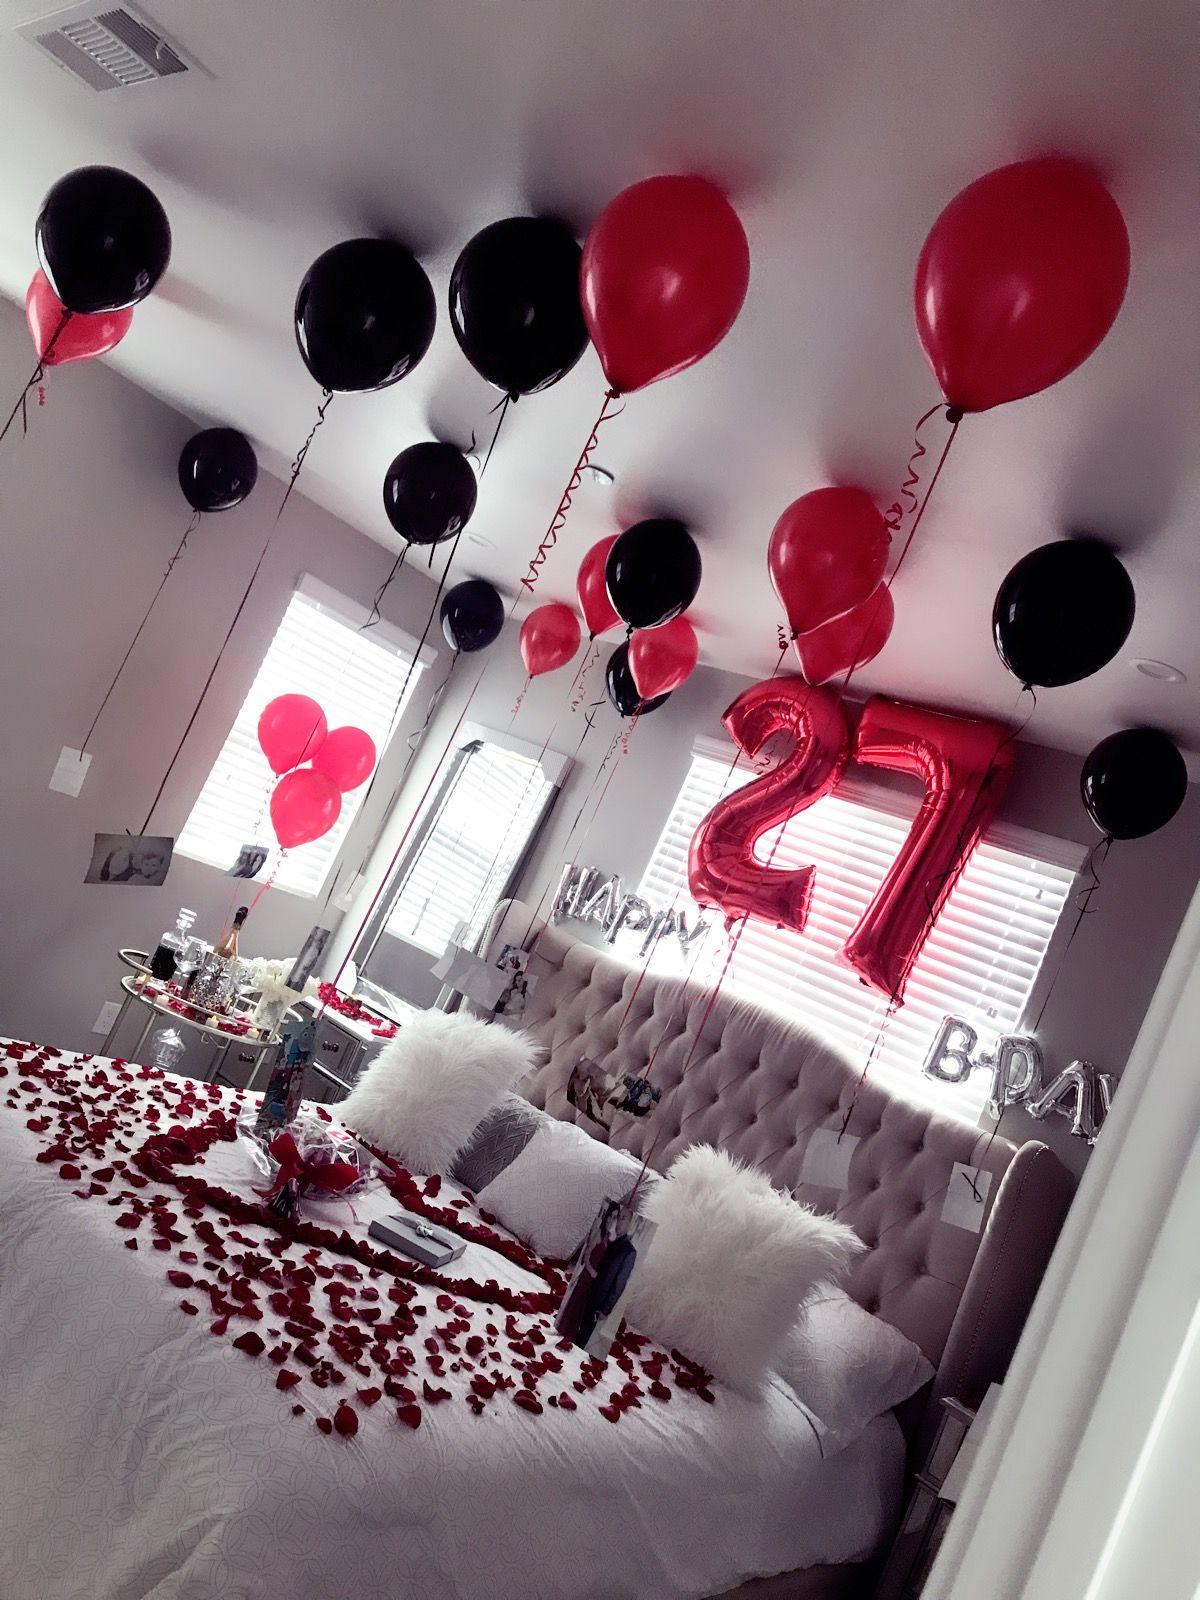 Romantic Bedroom Simple Room Decoration Ideas For Anniversary Novocom Top